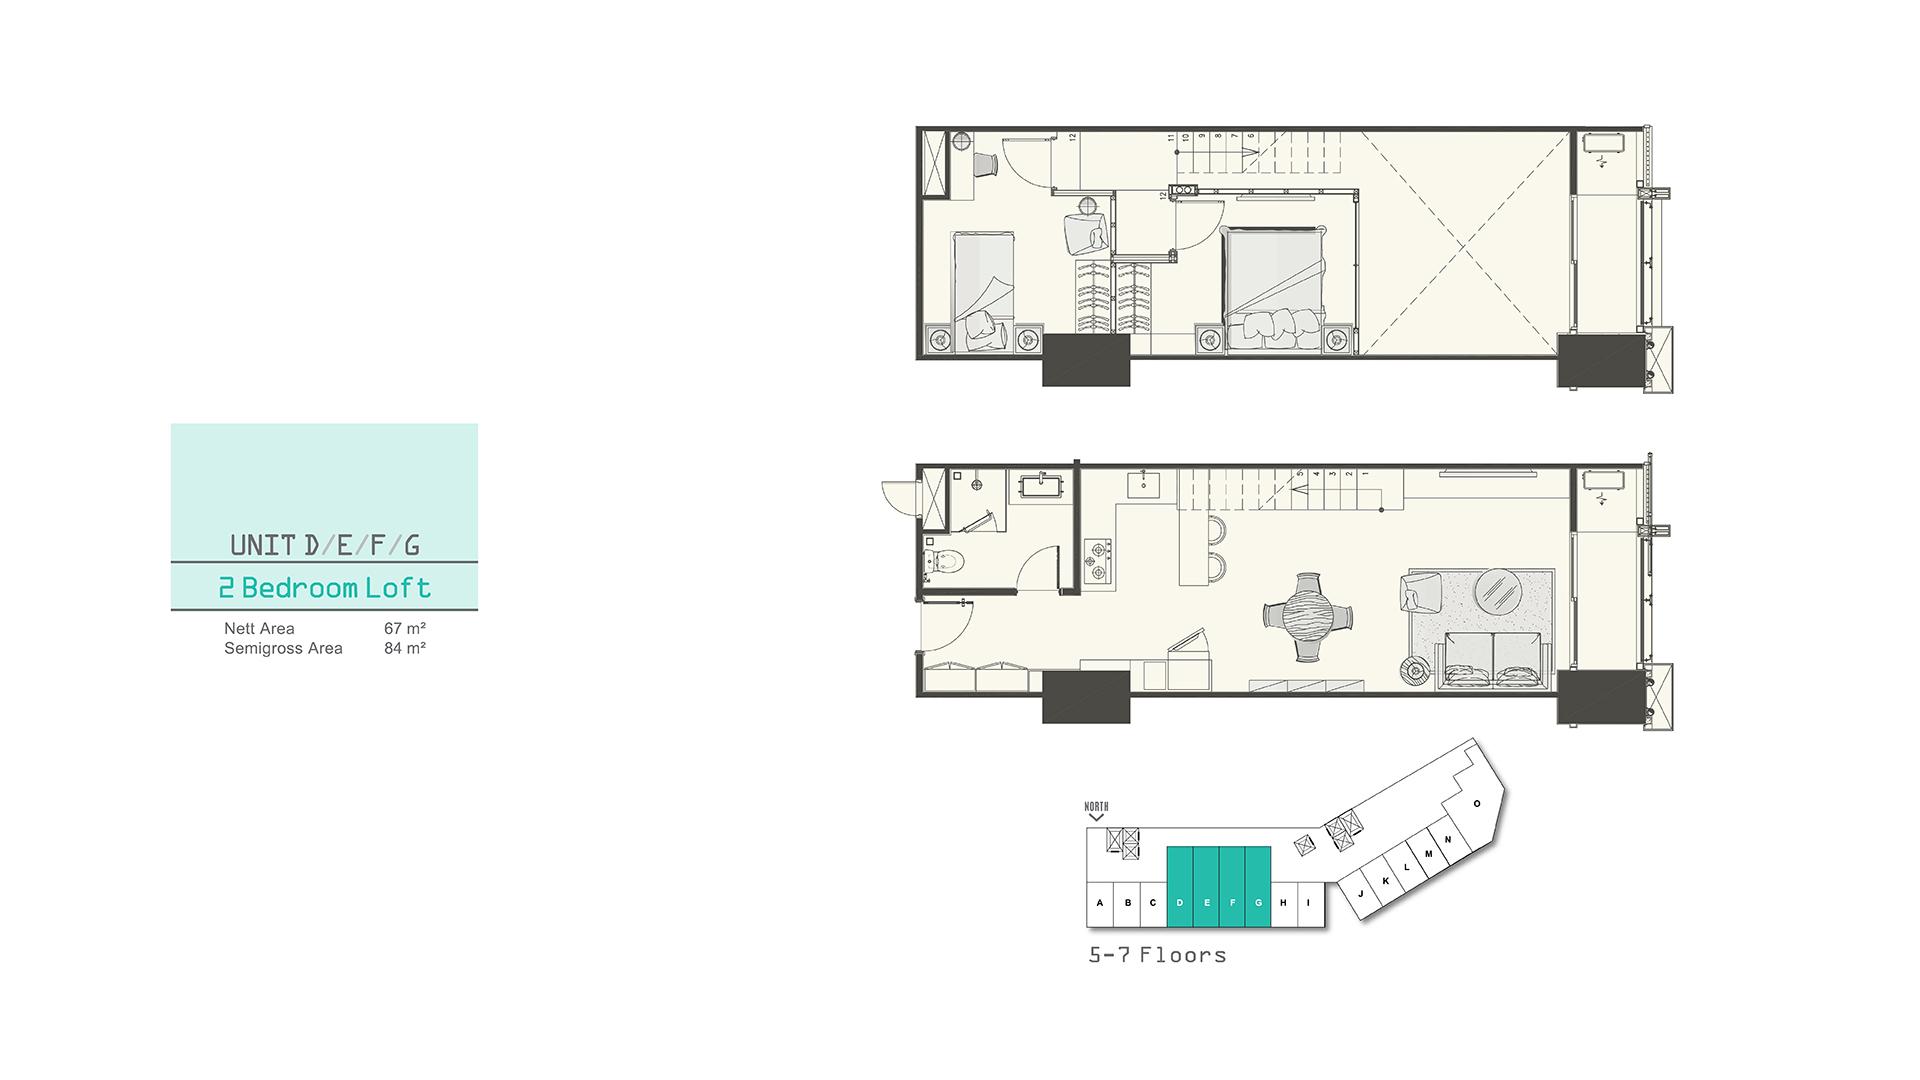 Southgate 2 Bedroom Loft (D,E,F,G)